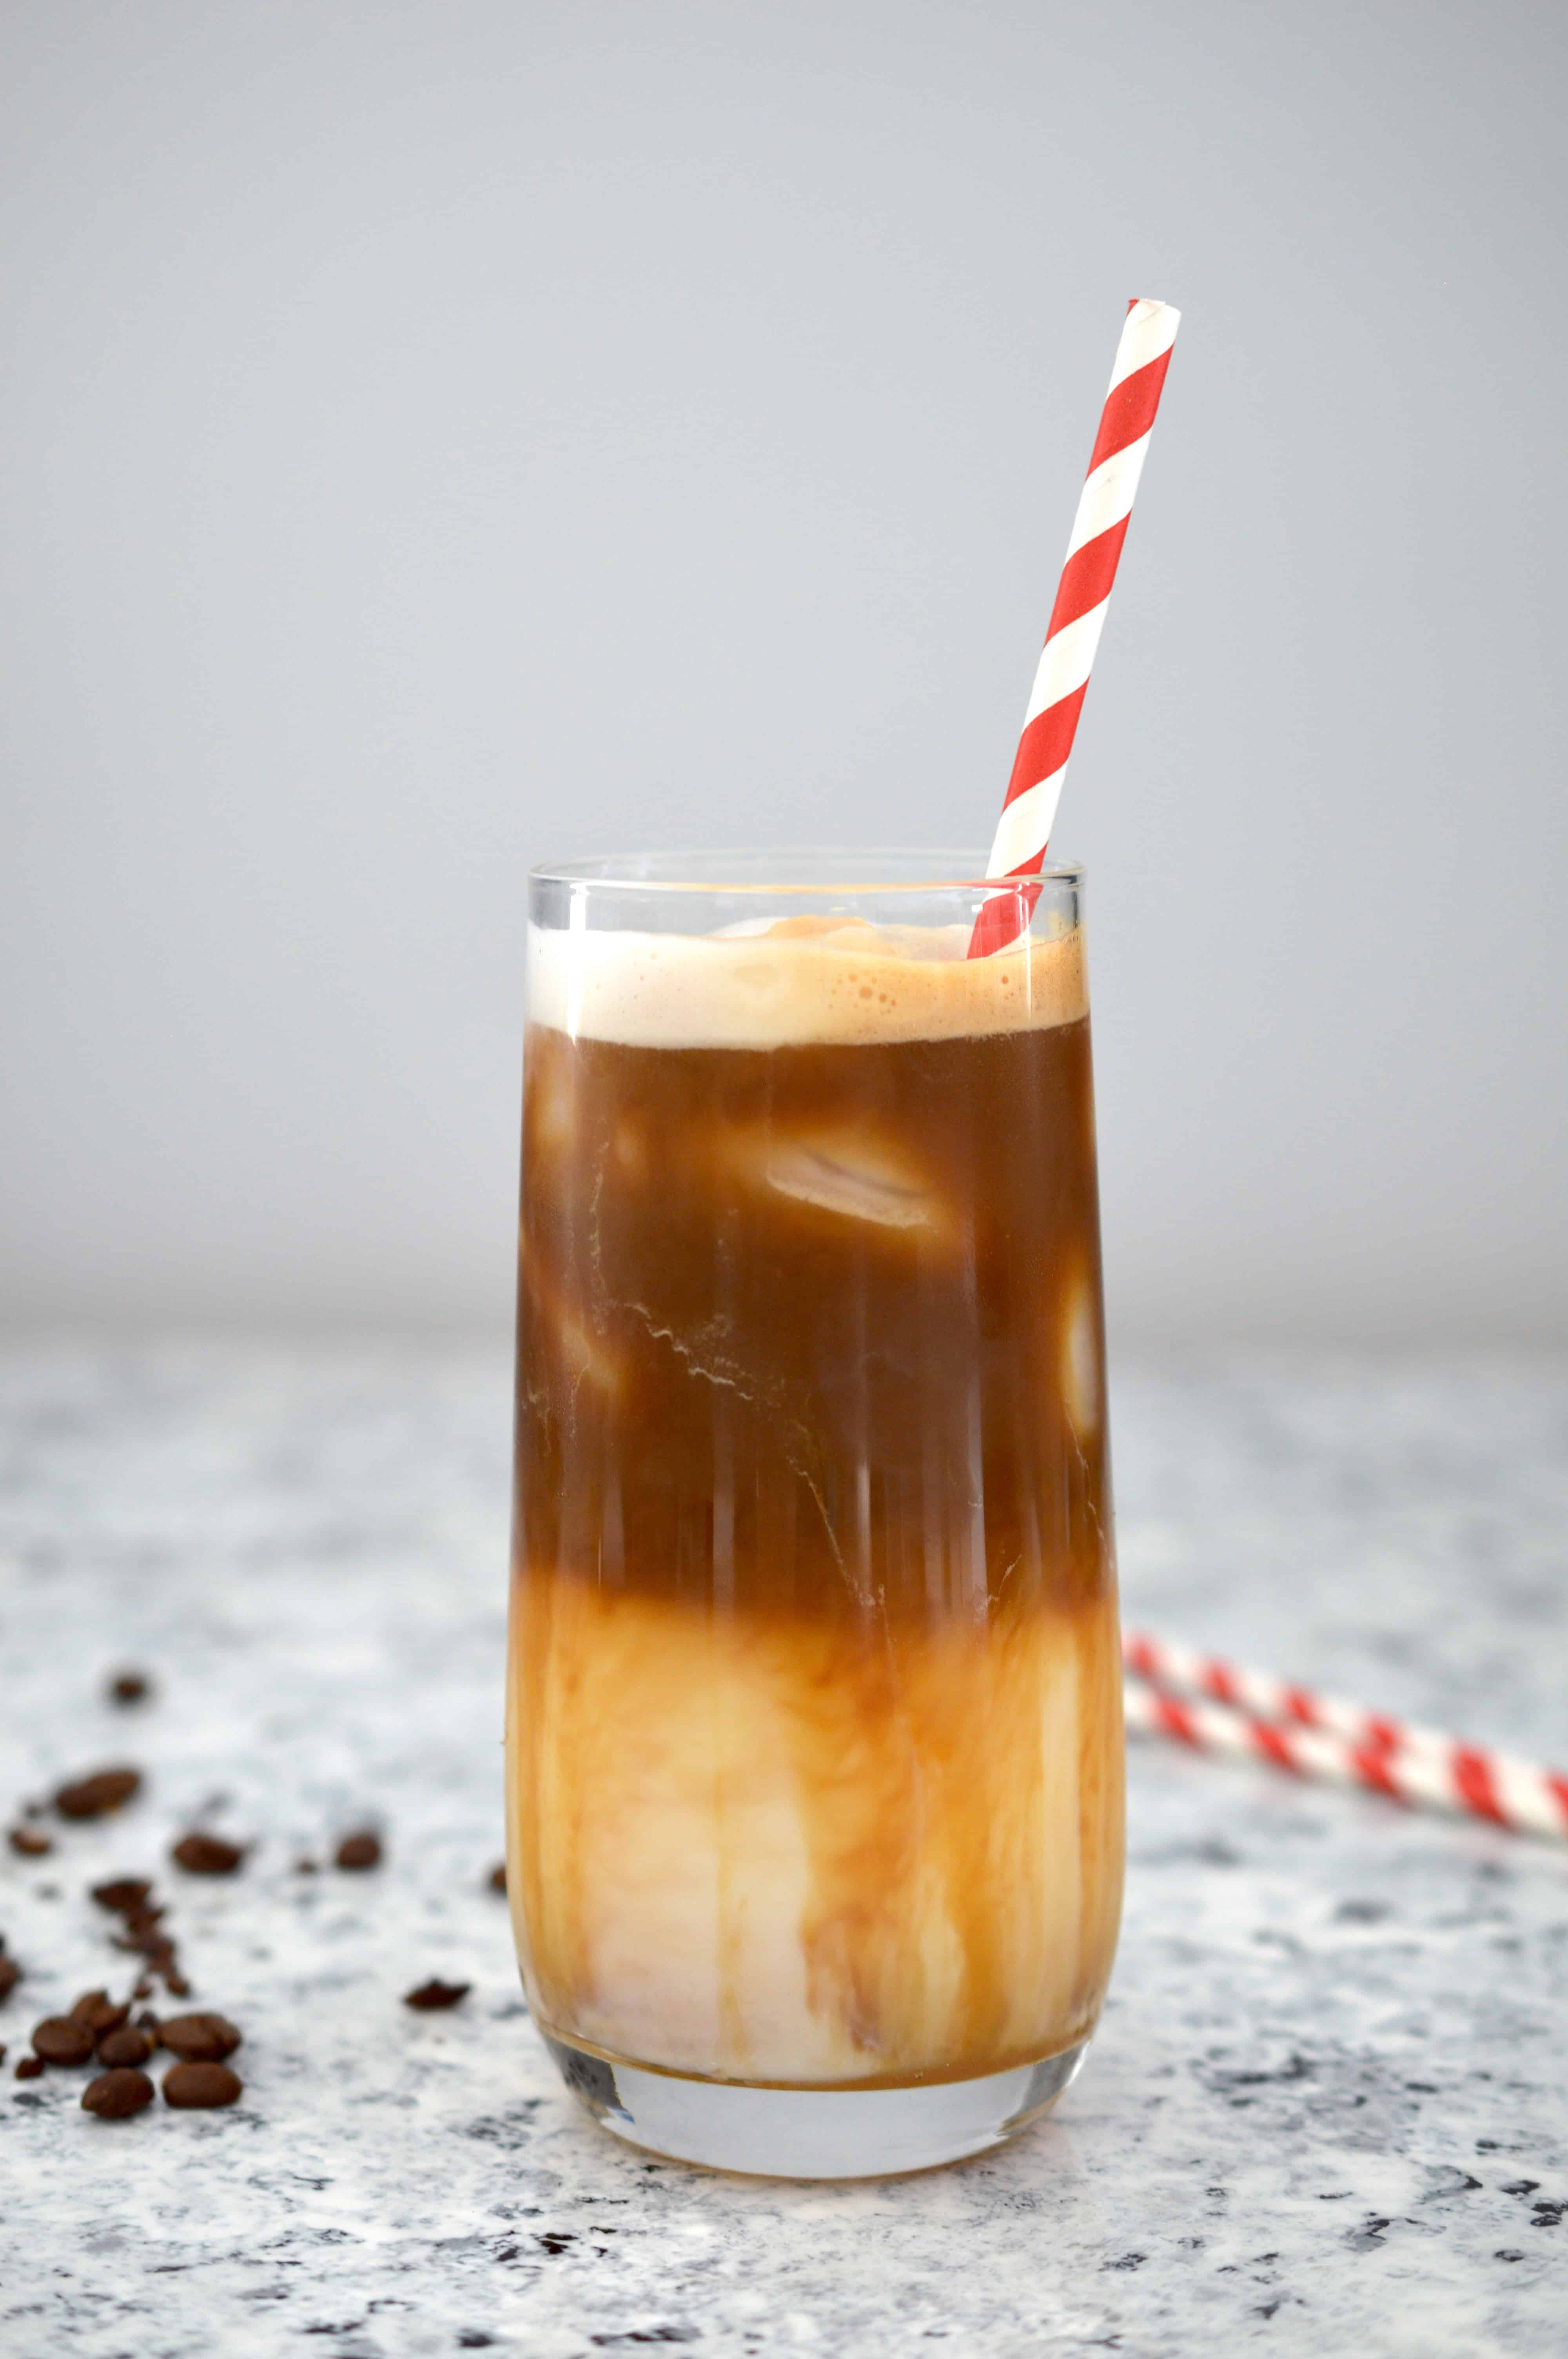 Starbucks Copycat Iced Caramel Macchiato Citrus Delicious